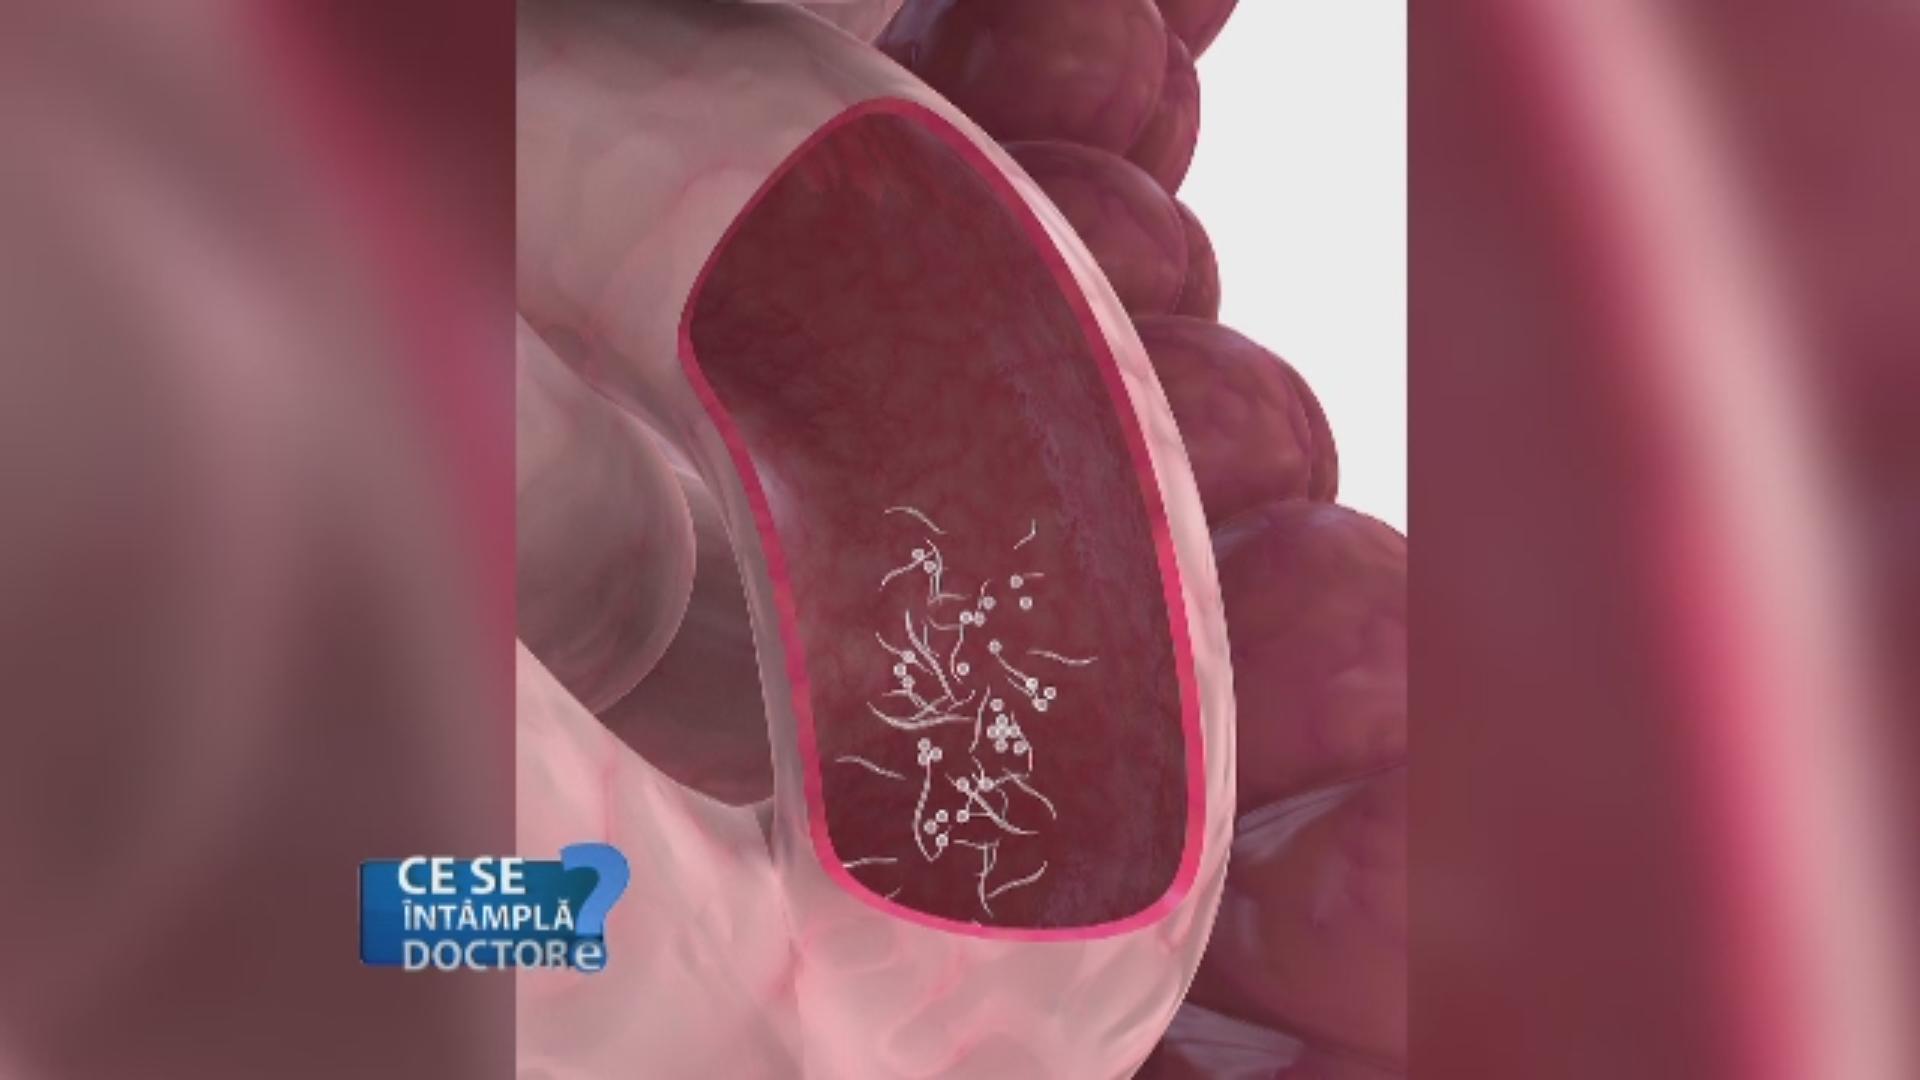 pentru copii pentru a preveni viermii gastric cancer article